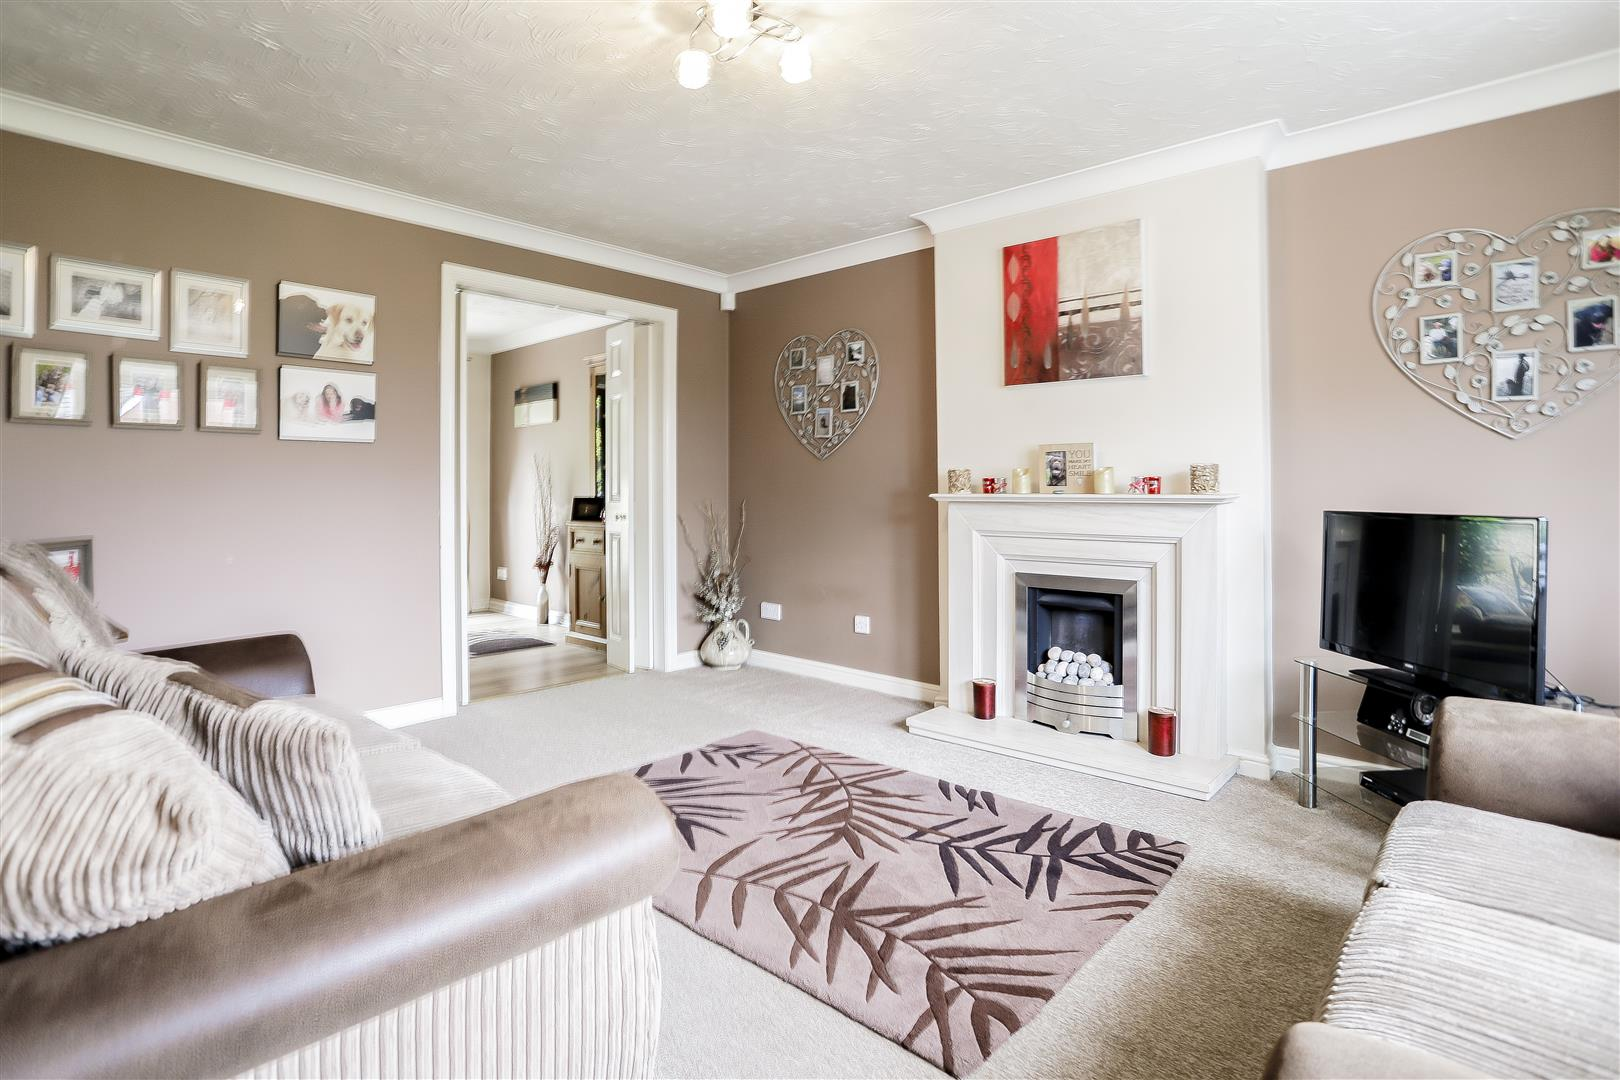 3 Bedroom Detached House For Sale - Main Image